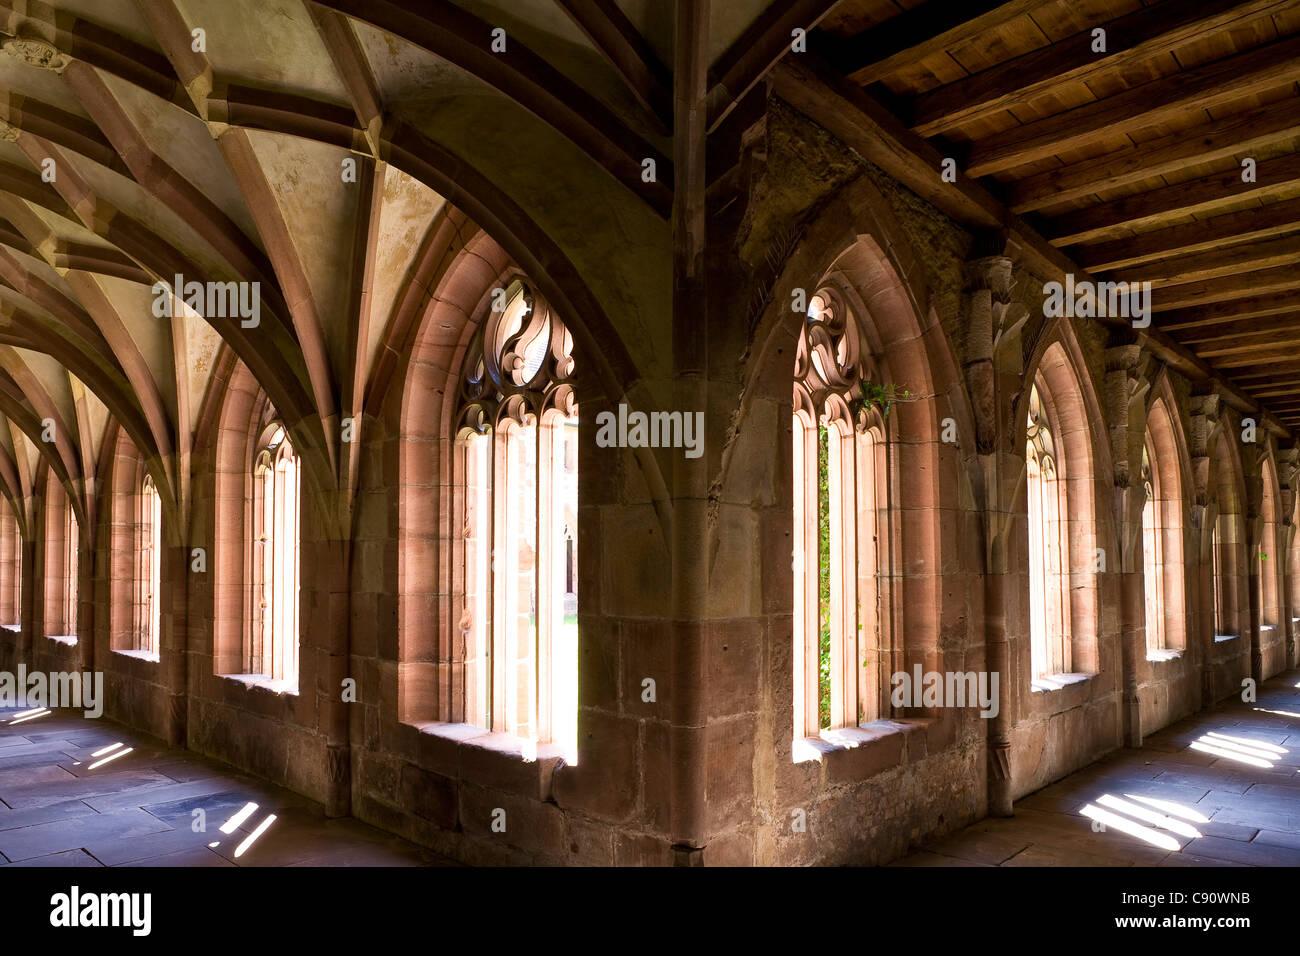 Le cloître d'abbaye d'Alpirsbach, ancien monastère bénédictin, Alpirsbach, Bade-Wurtemberg, Photo Stock